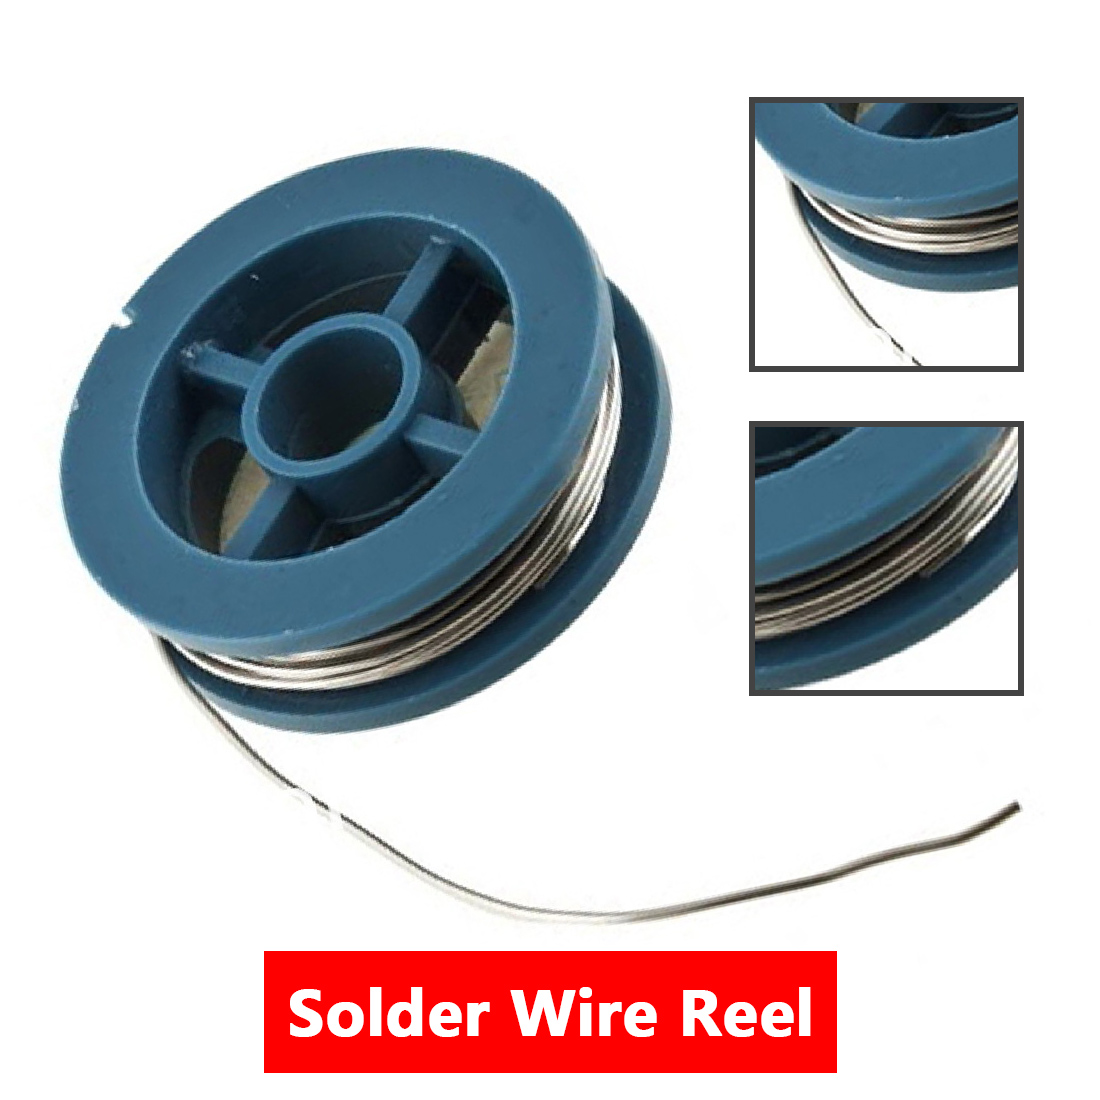 1.0mm 40/60 Tin/Resin Flux Rosin Core Solder Soldering Wire & Pen ...